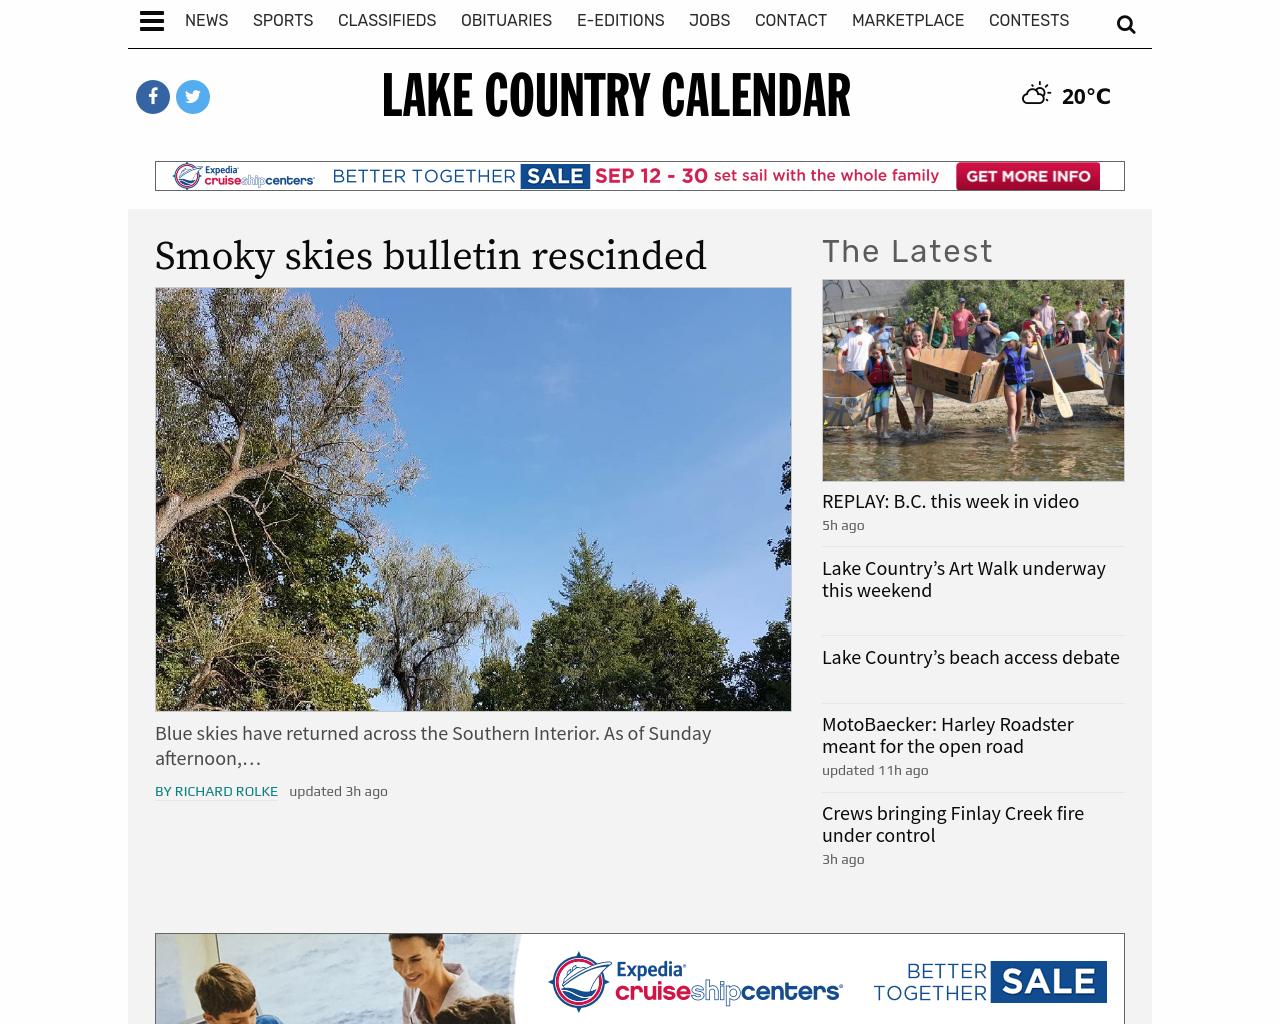 Lake-Country-Calendar-Advertising-Reviews-Pricing